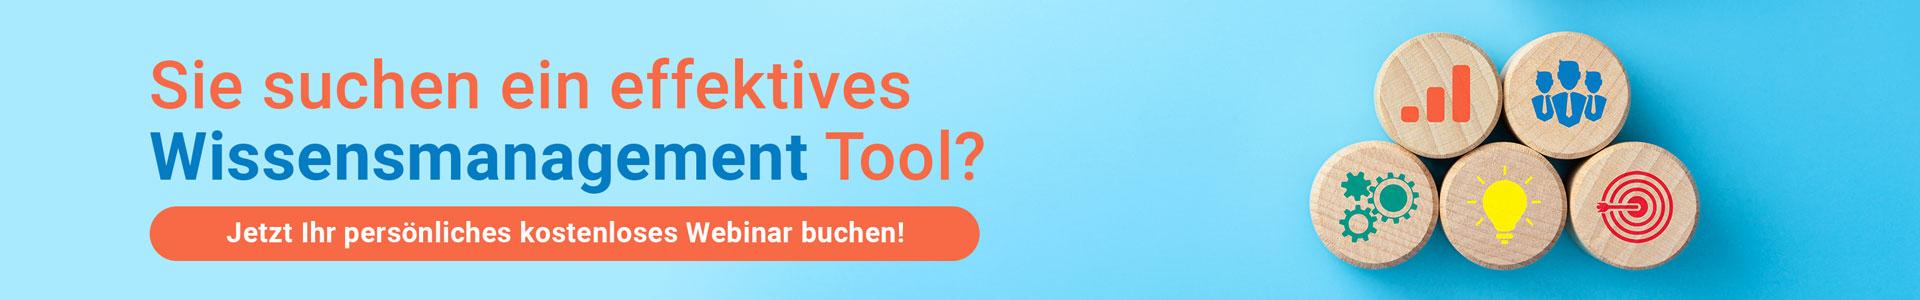 innolytics-wissensmanagement-tools-aufbauen-webinar